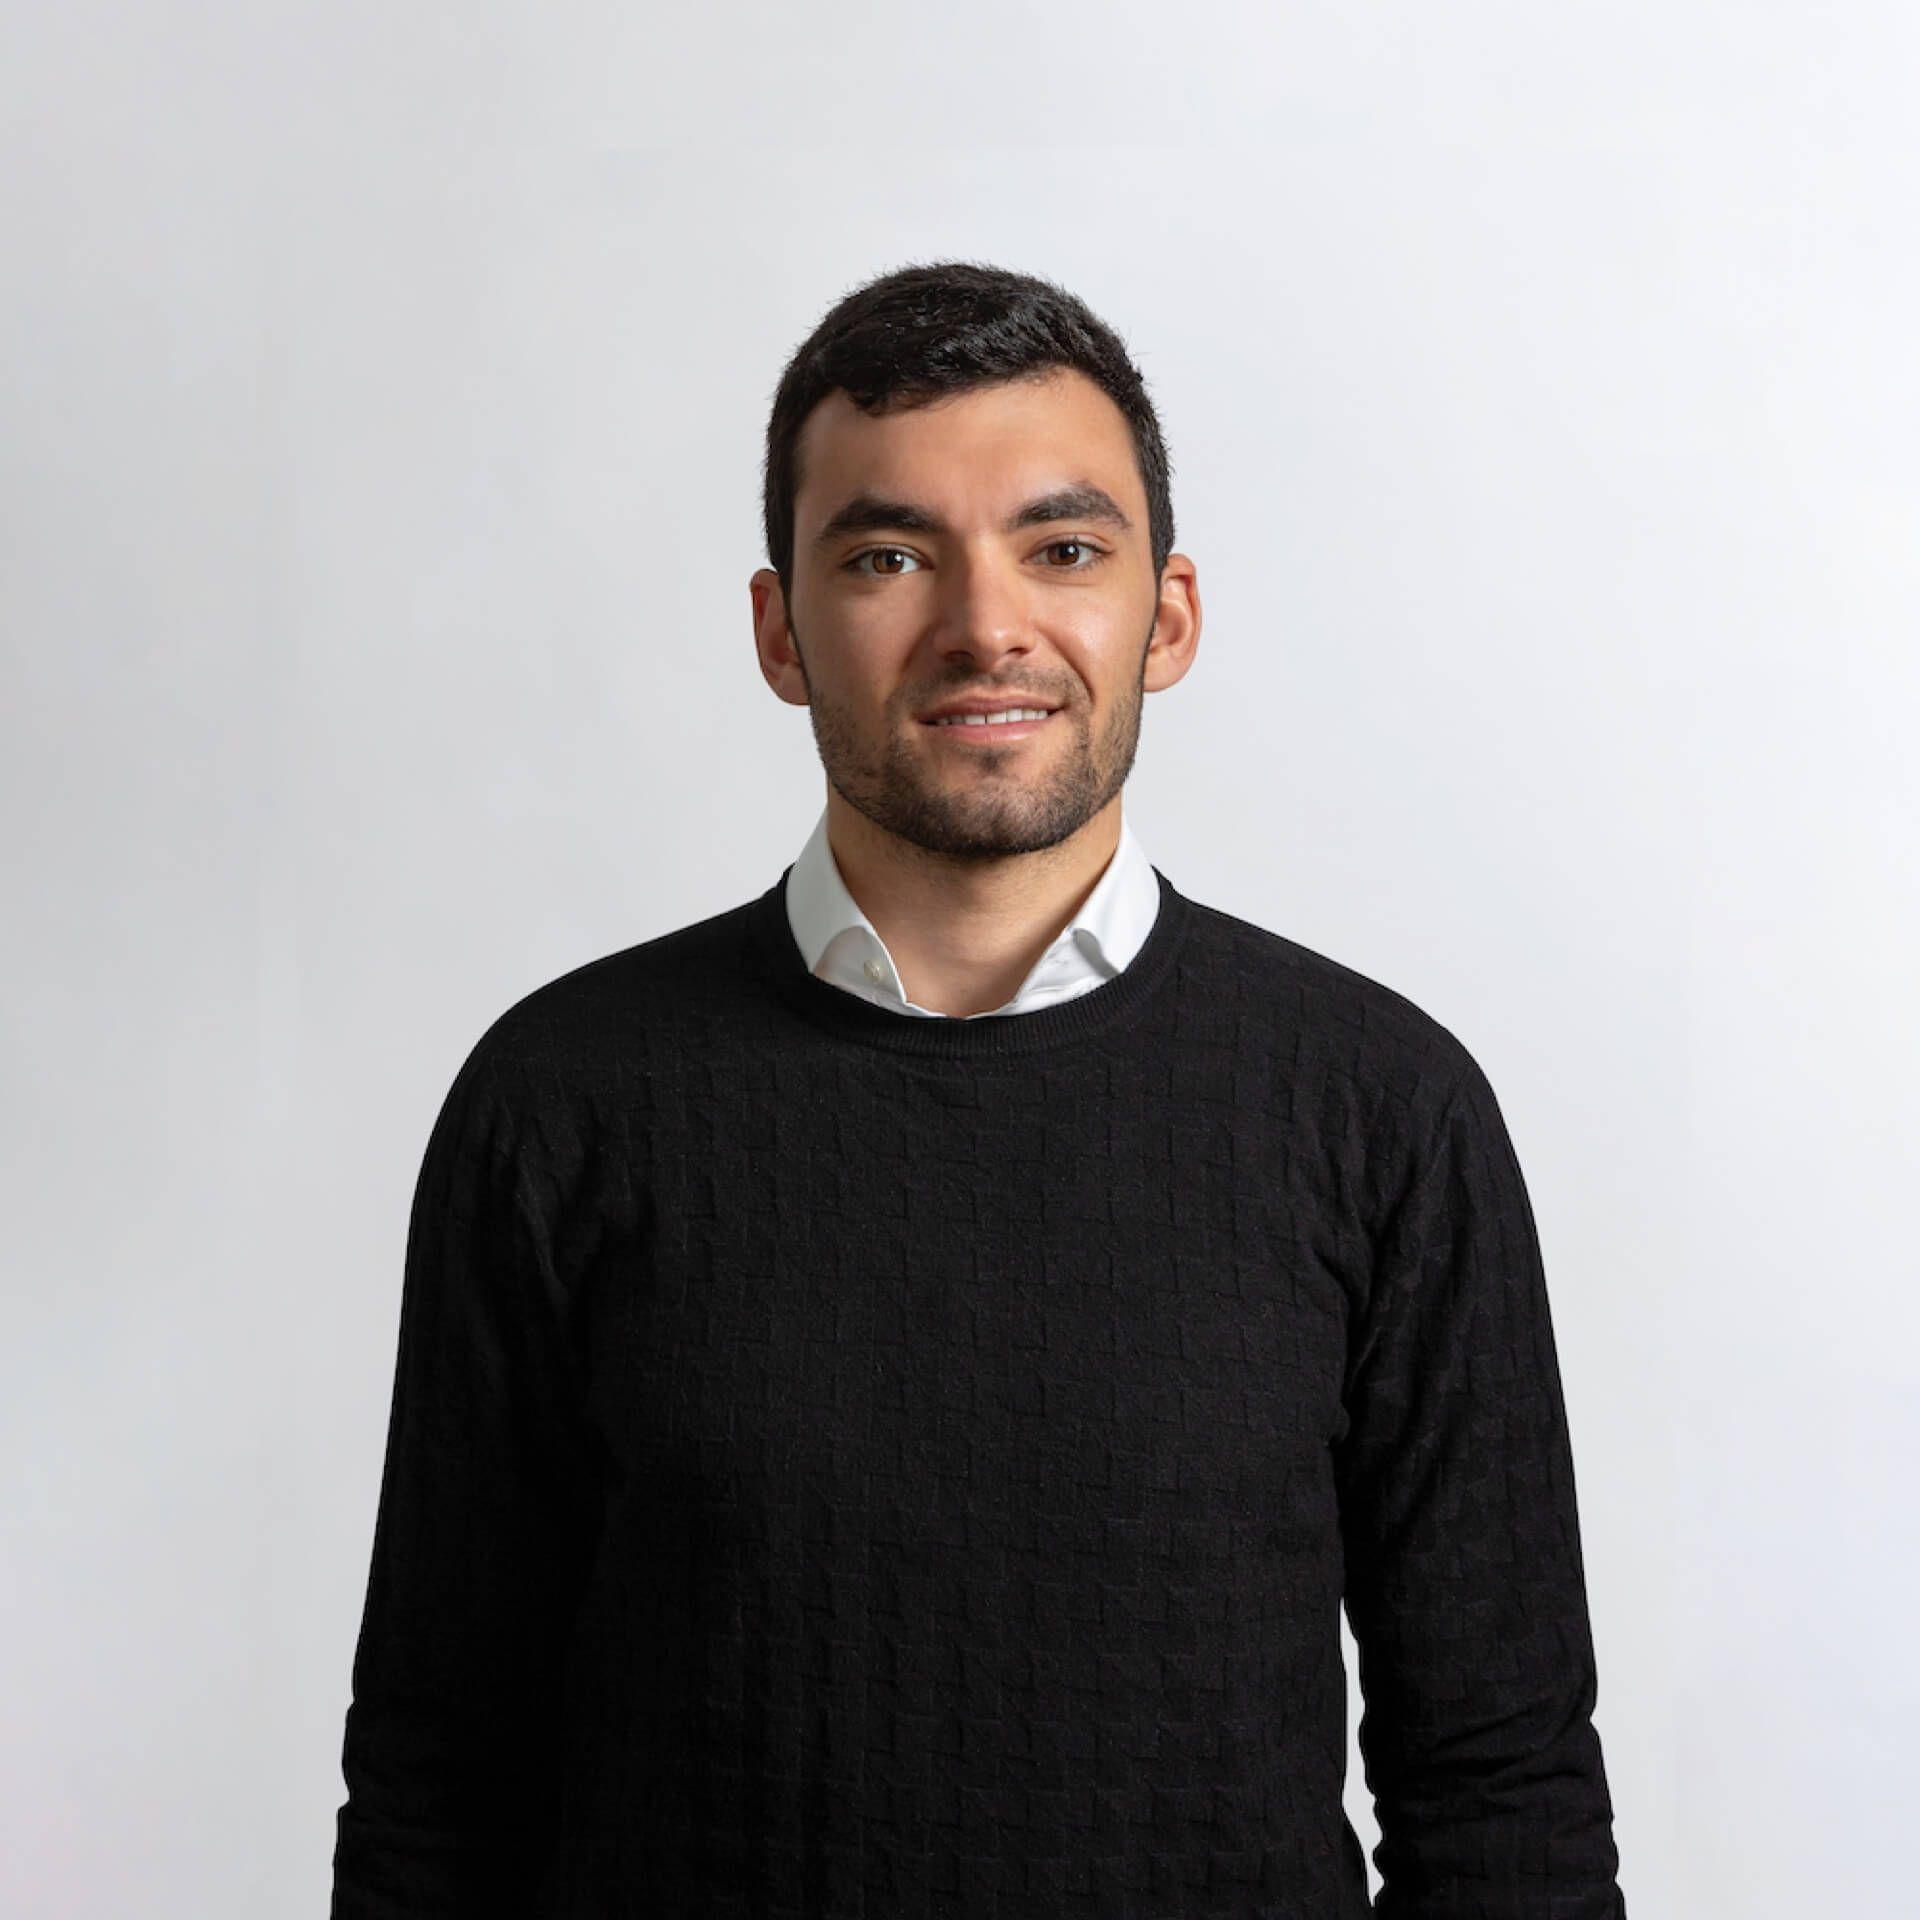 Karim Fattal